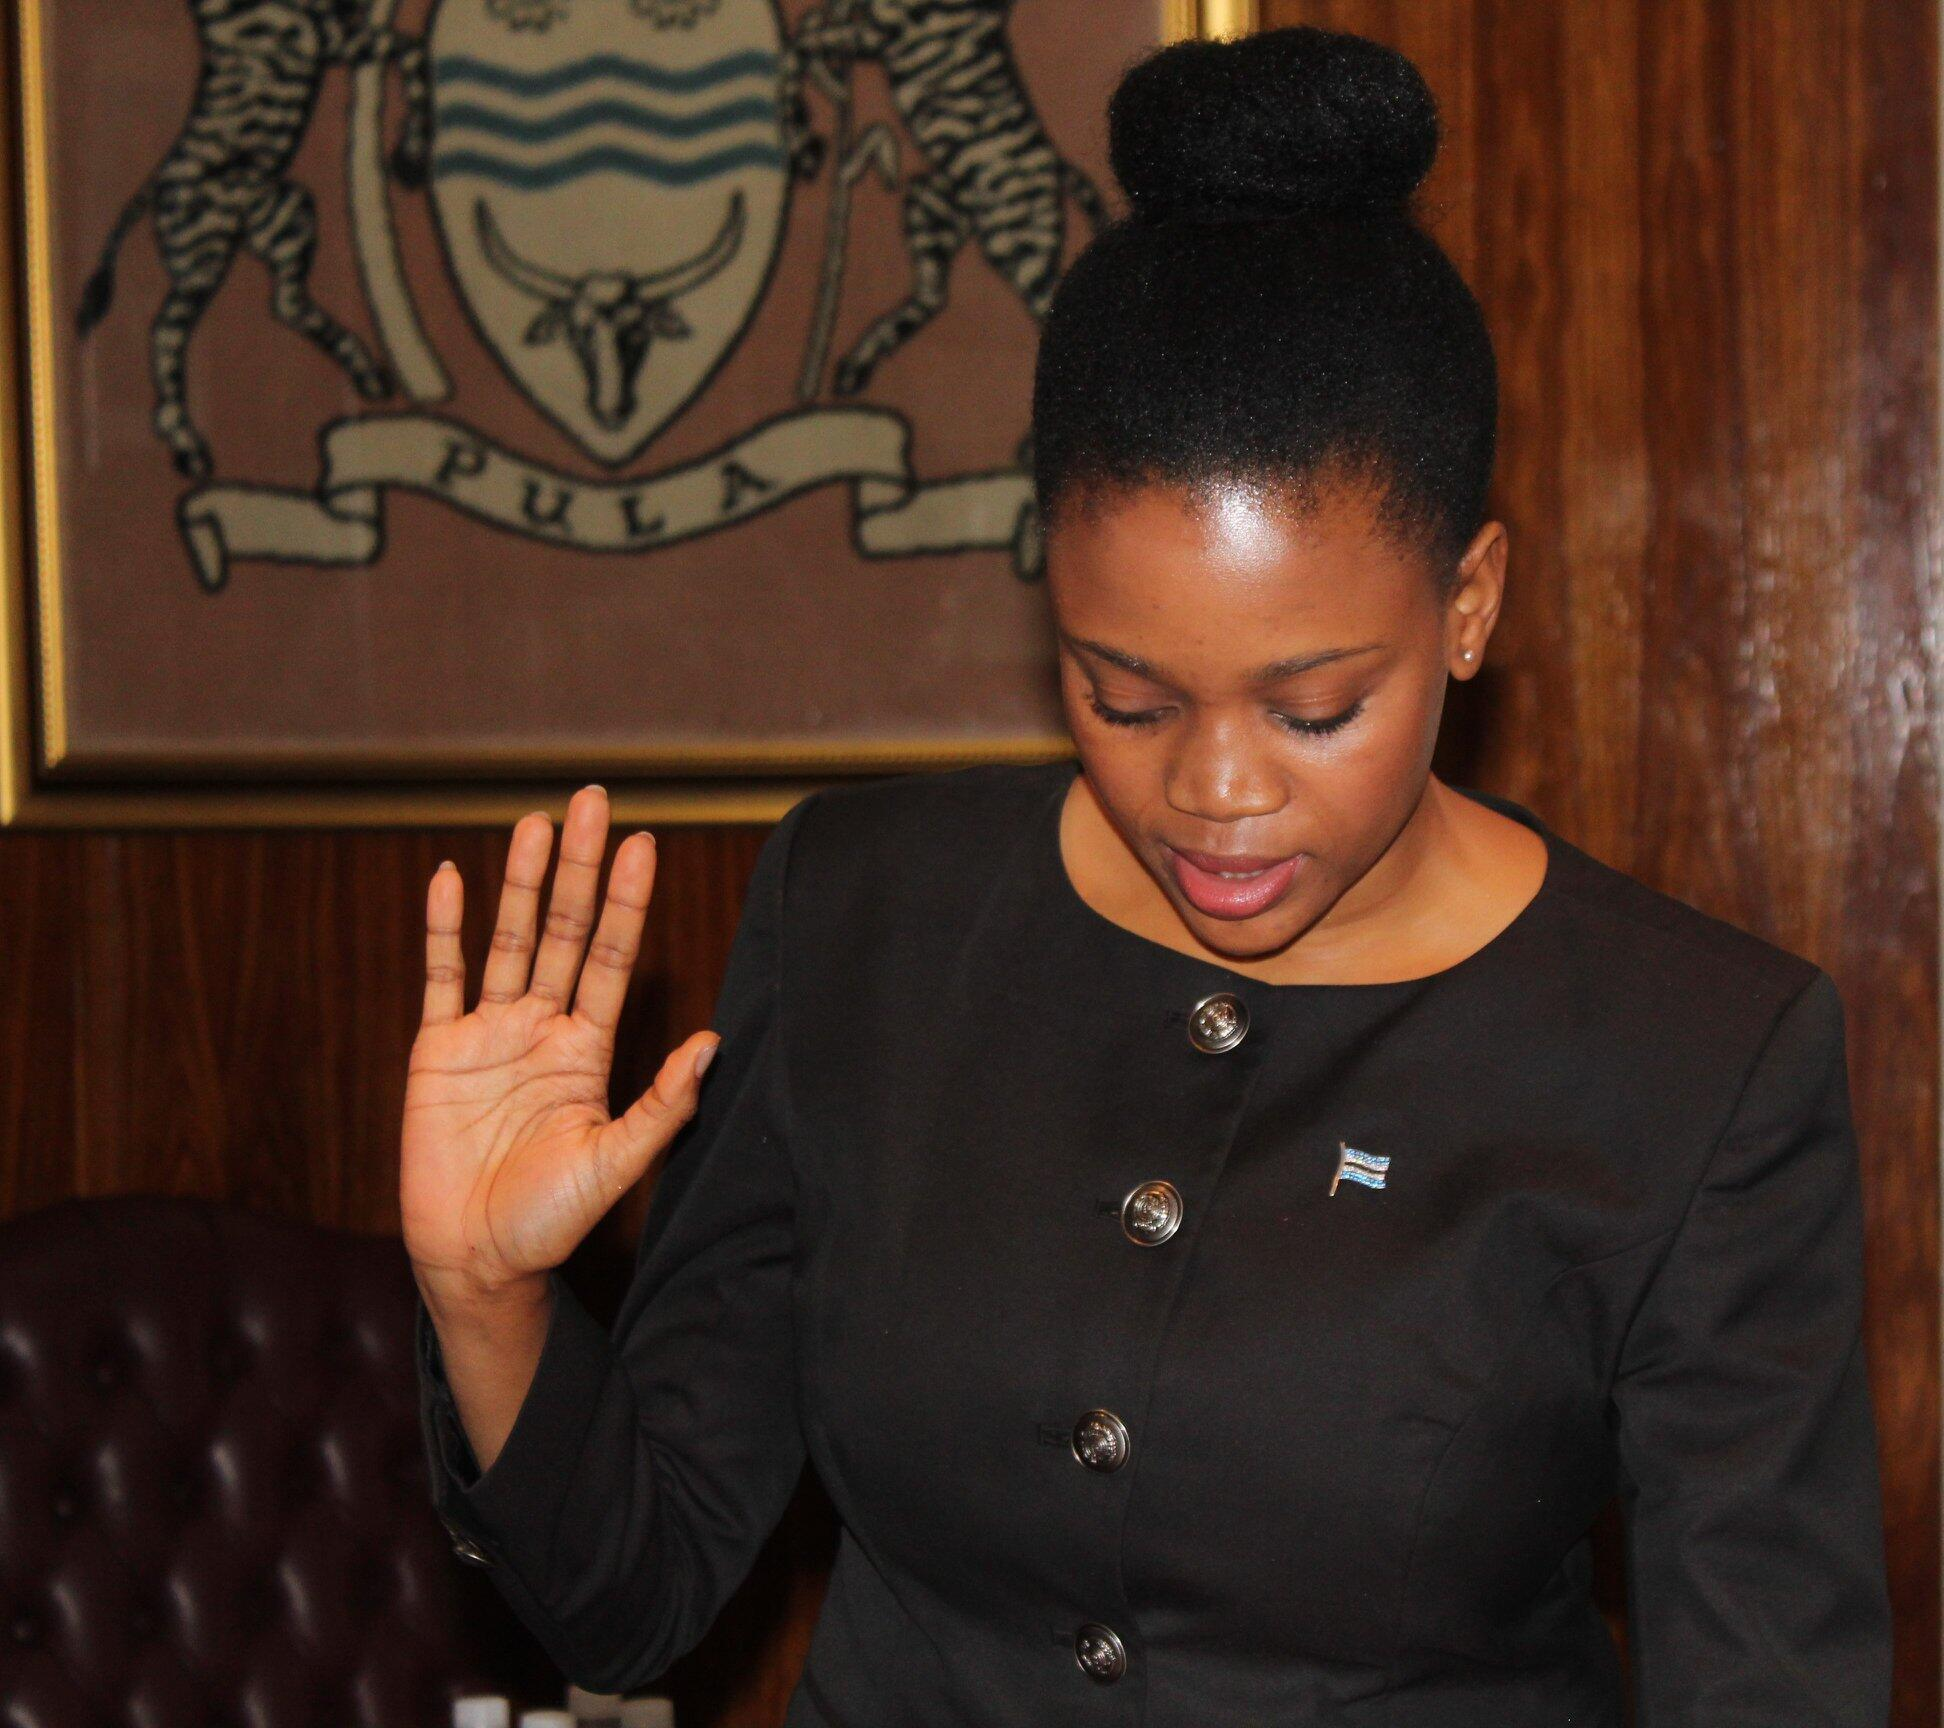 Kenewendo taking the oath of office on 5 April 2018.